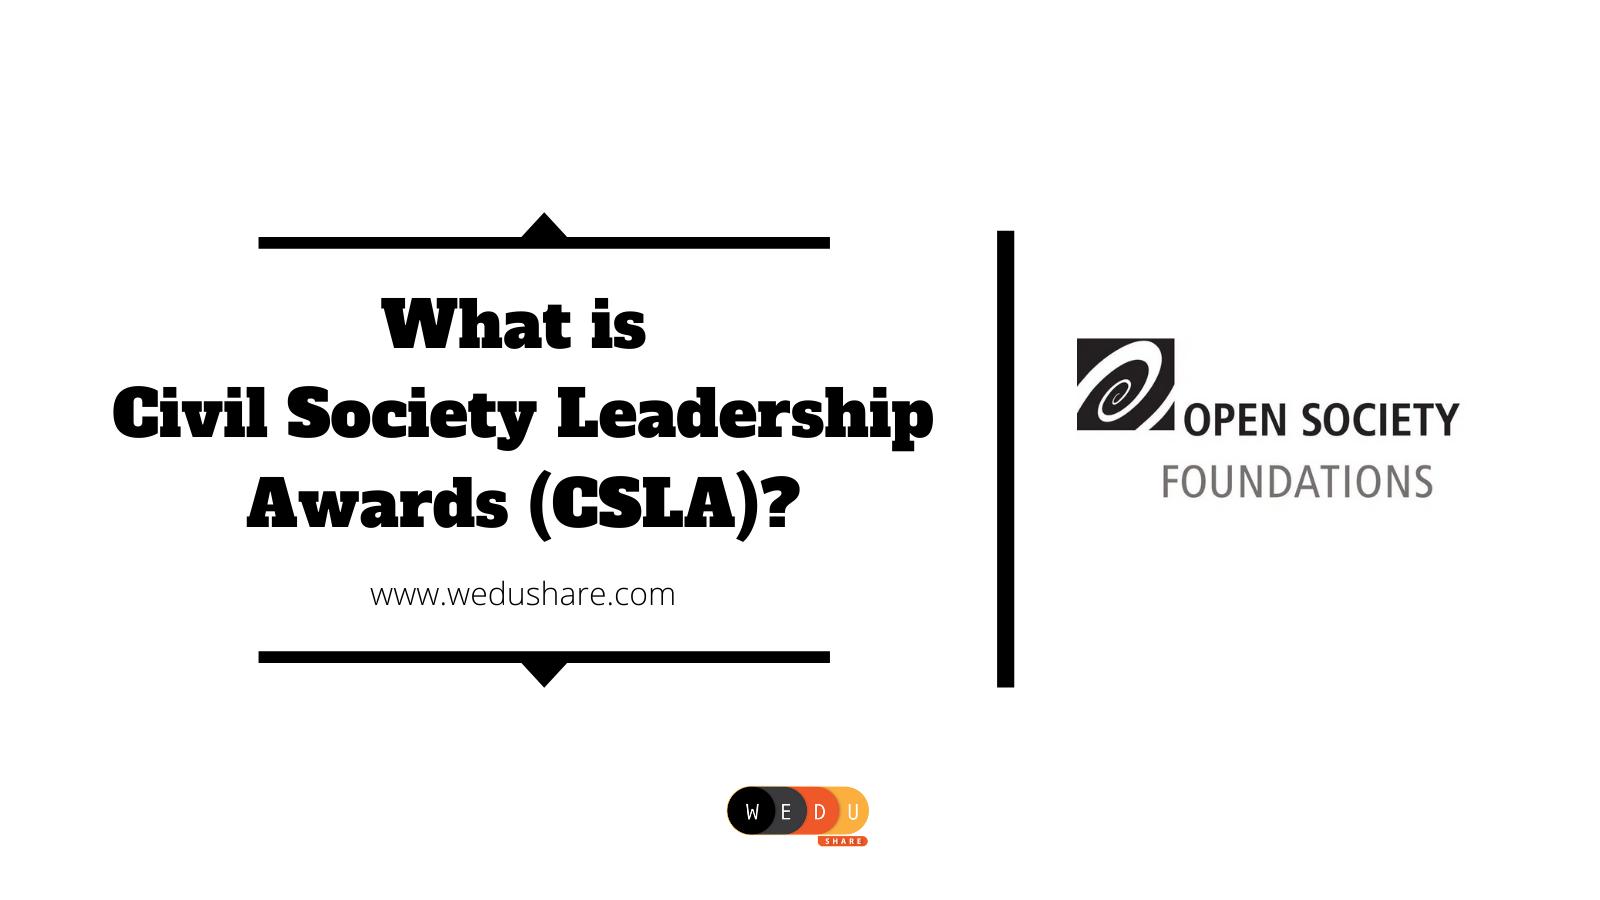 What is Civil Society Leadership Awards (CSLA)?